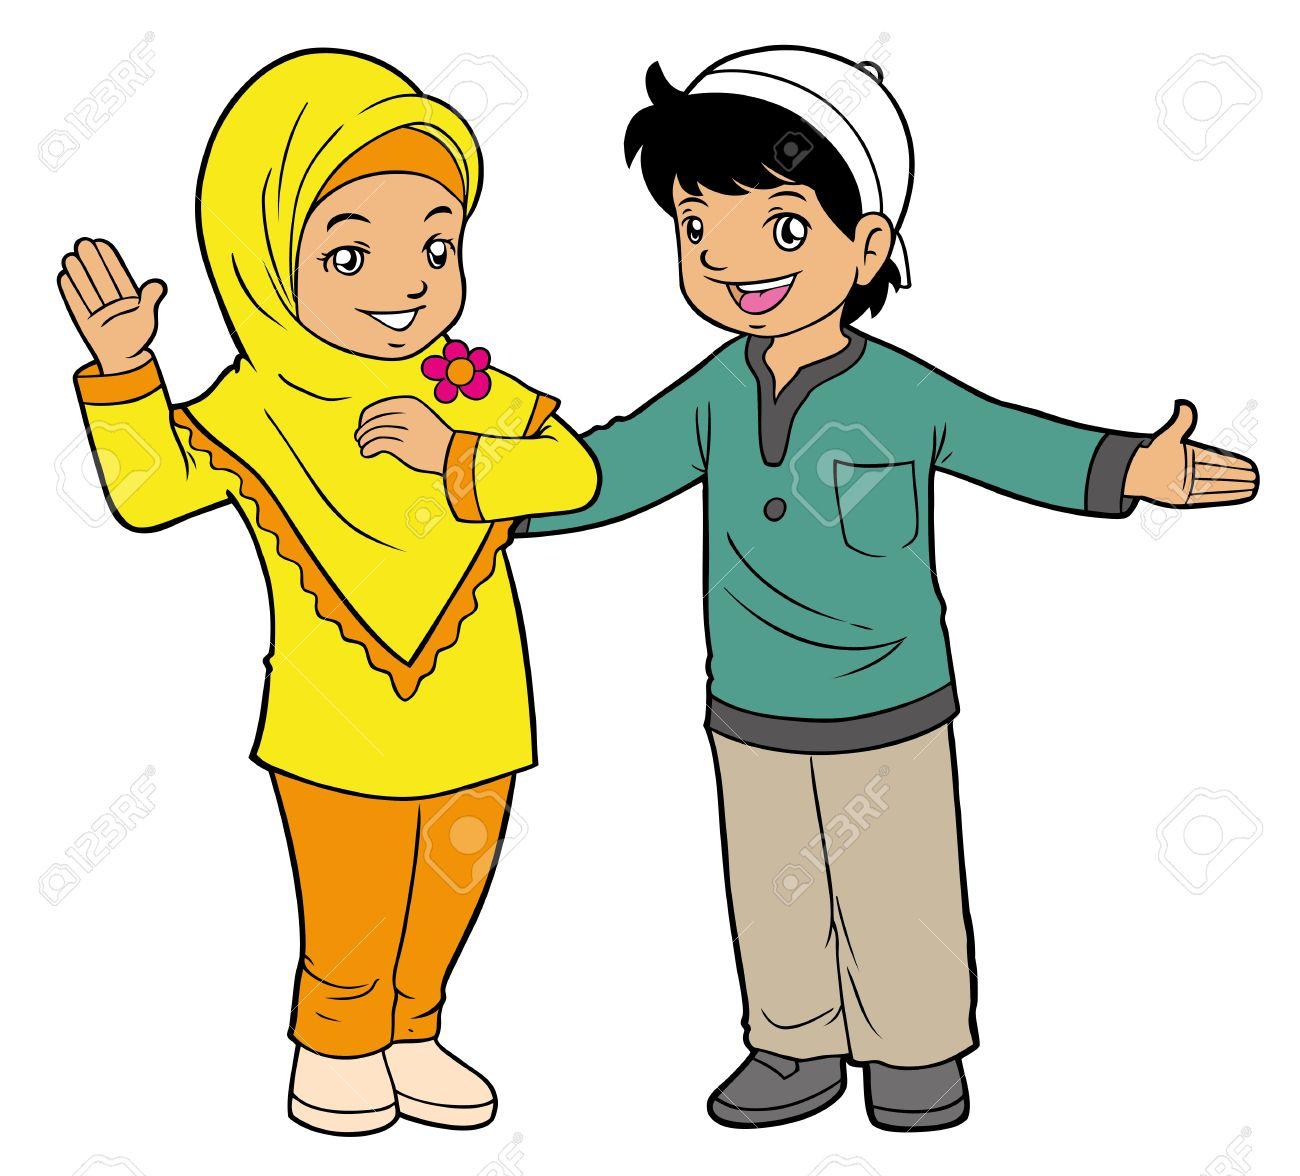 Arabic clipart kids download Muslim children clipart - ClipartFest download